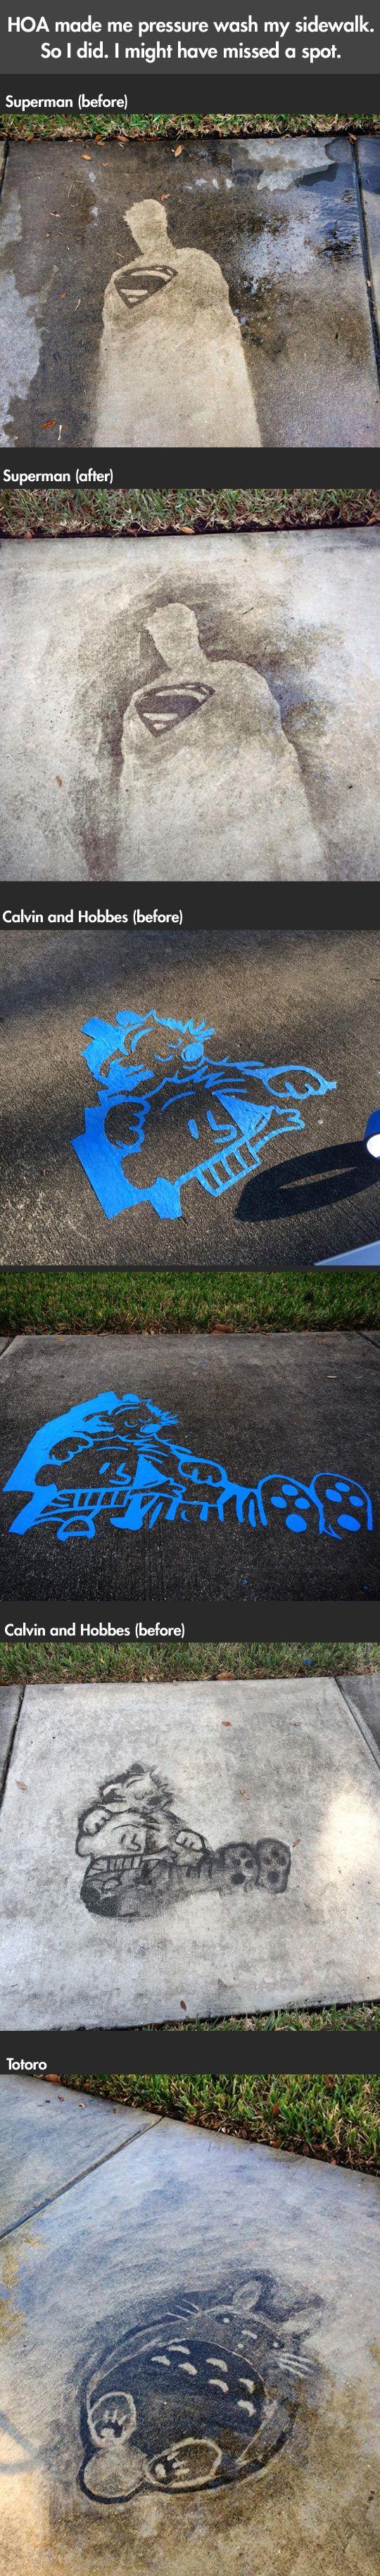 Comics drawn on a sidewalk with a pressure washer…